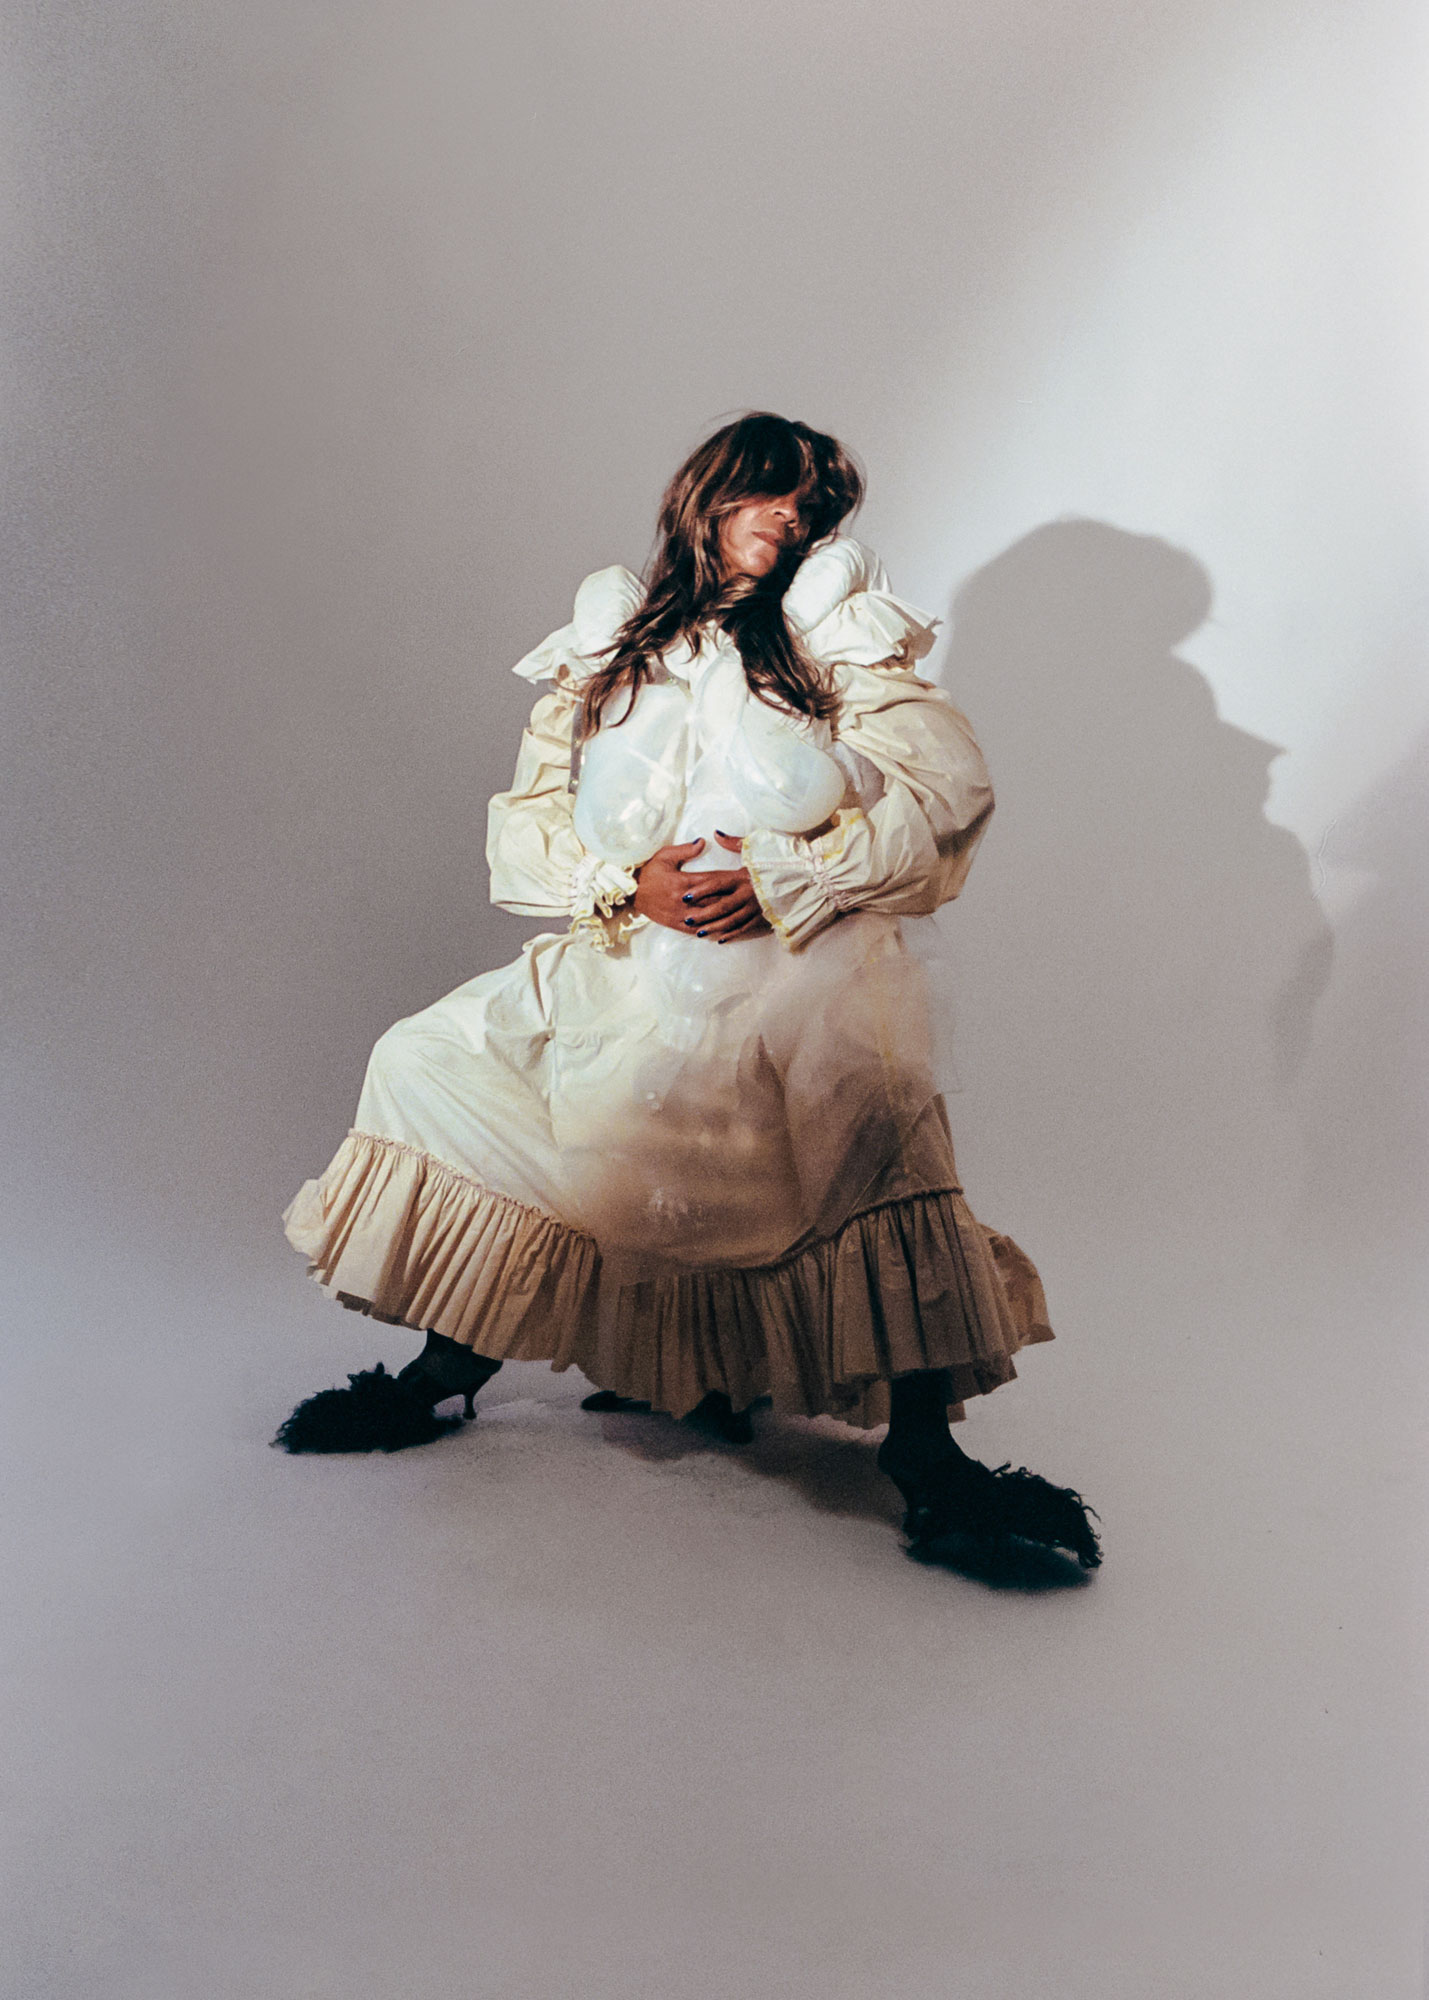 Fabian Kis-Juhasz dress, Sinead O'Dwyer top, Western Affair shoes